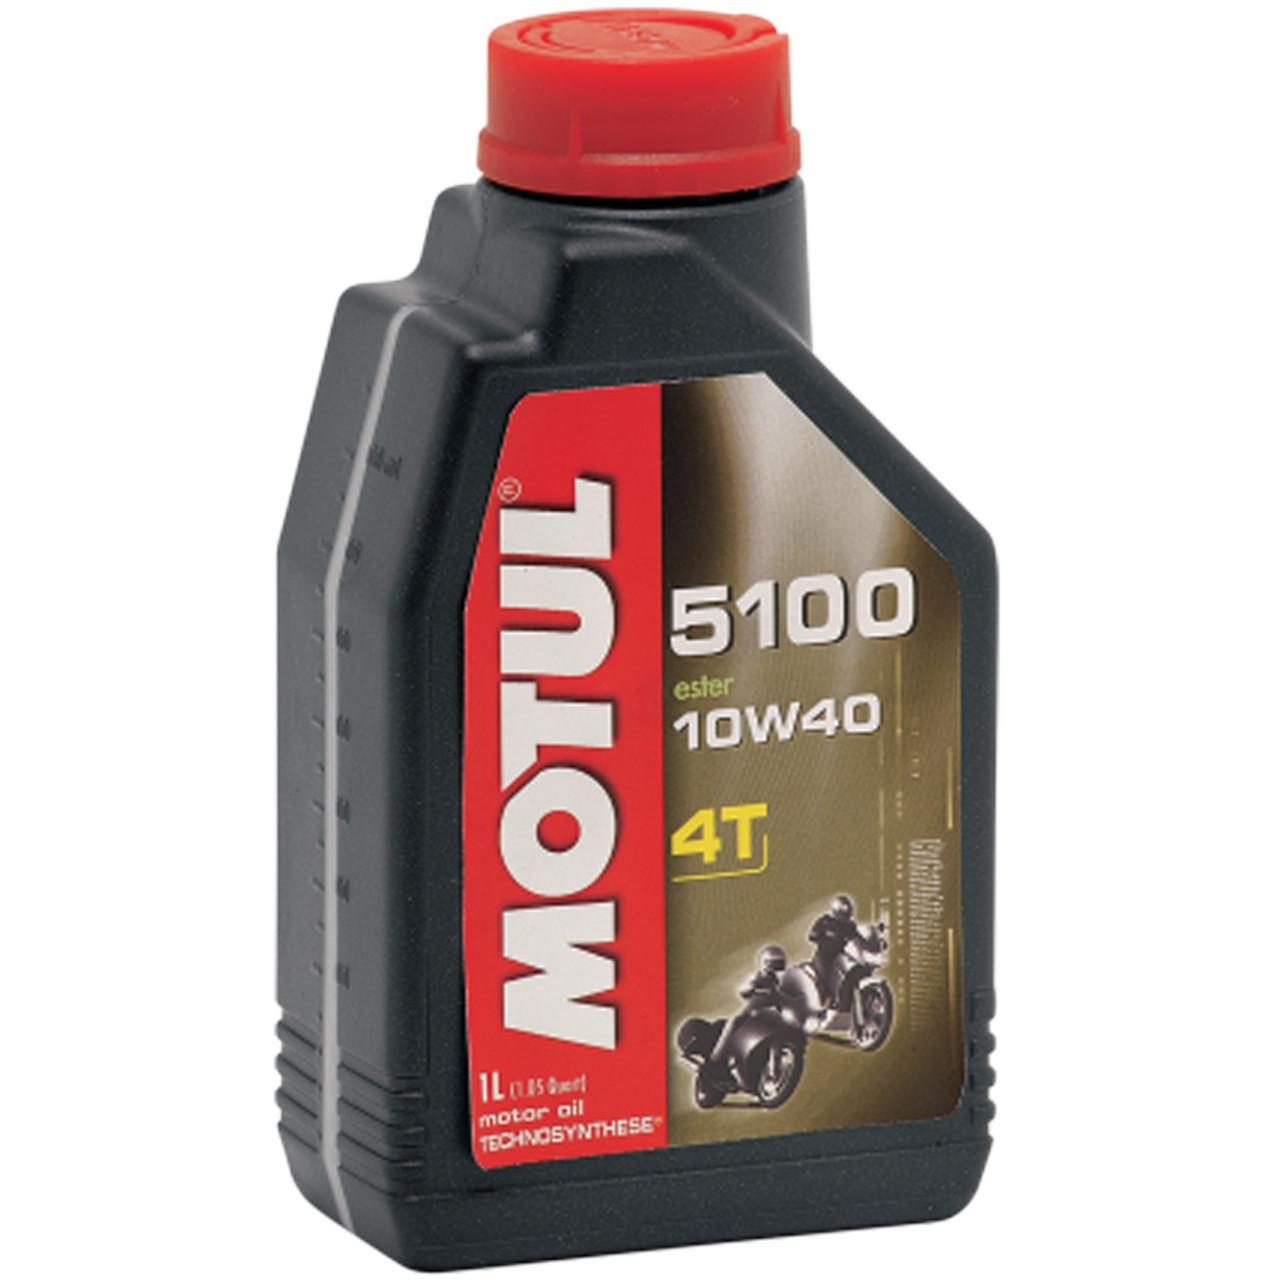 motul 5100 10w40 synthetic blend motorcycle oil sportbike track gear. Black Bedroom Furniture Sets. Home Design Ideas